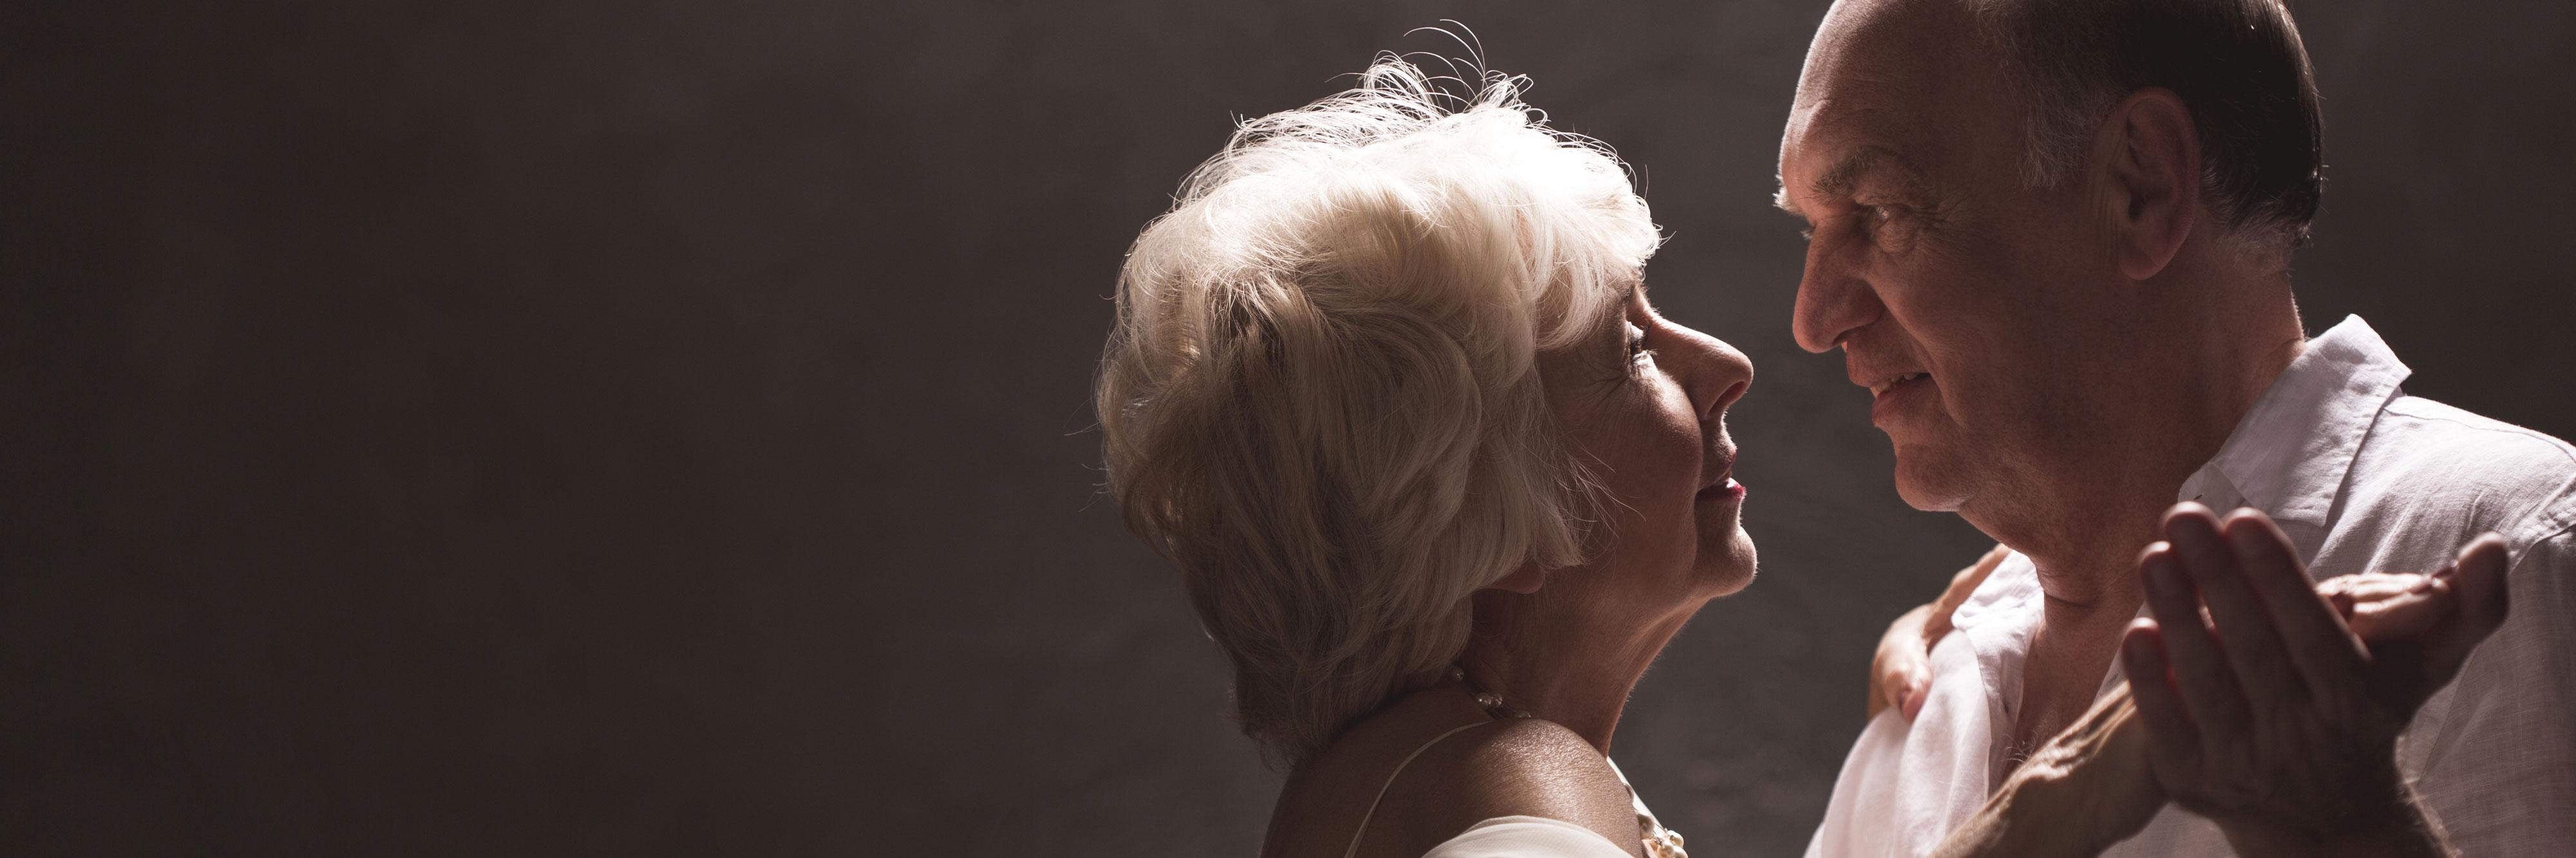 fidelio paris couples seniors rencontres serieuses carole durand